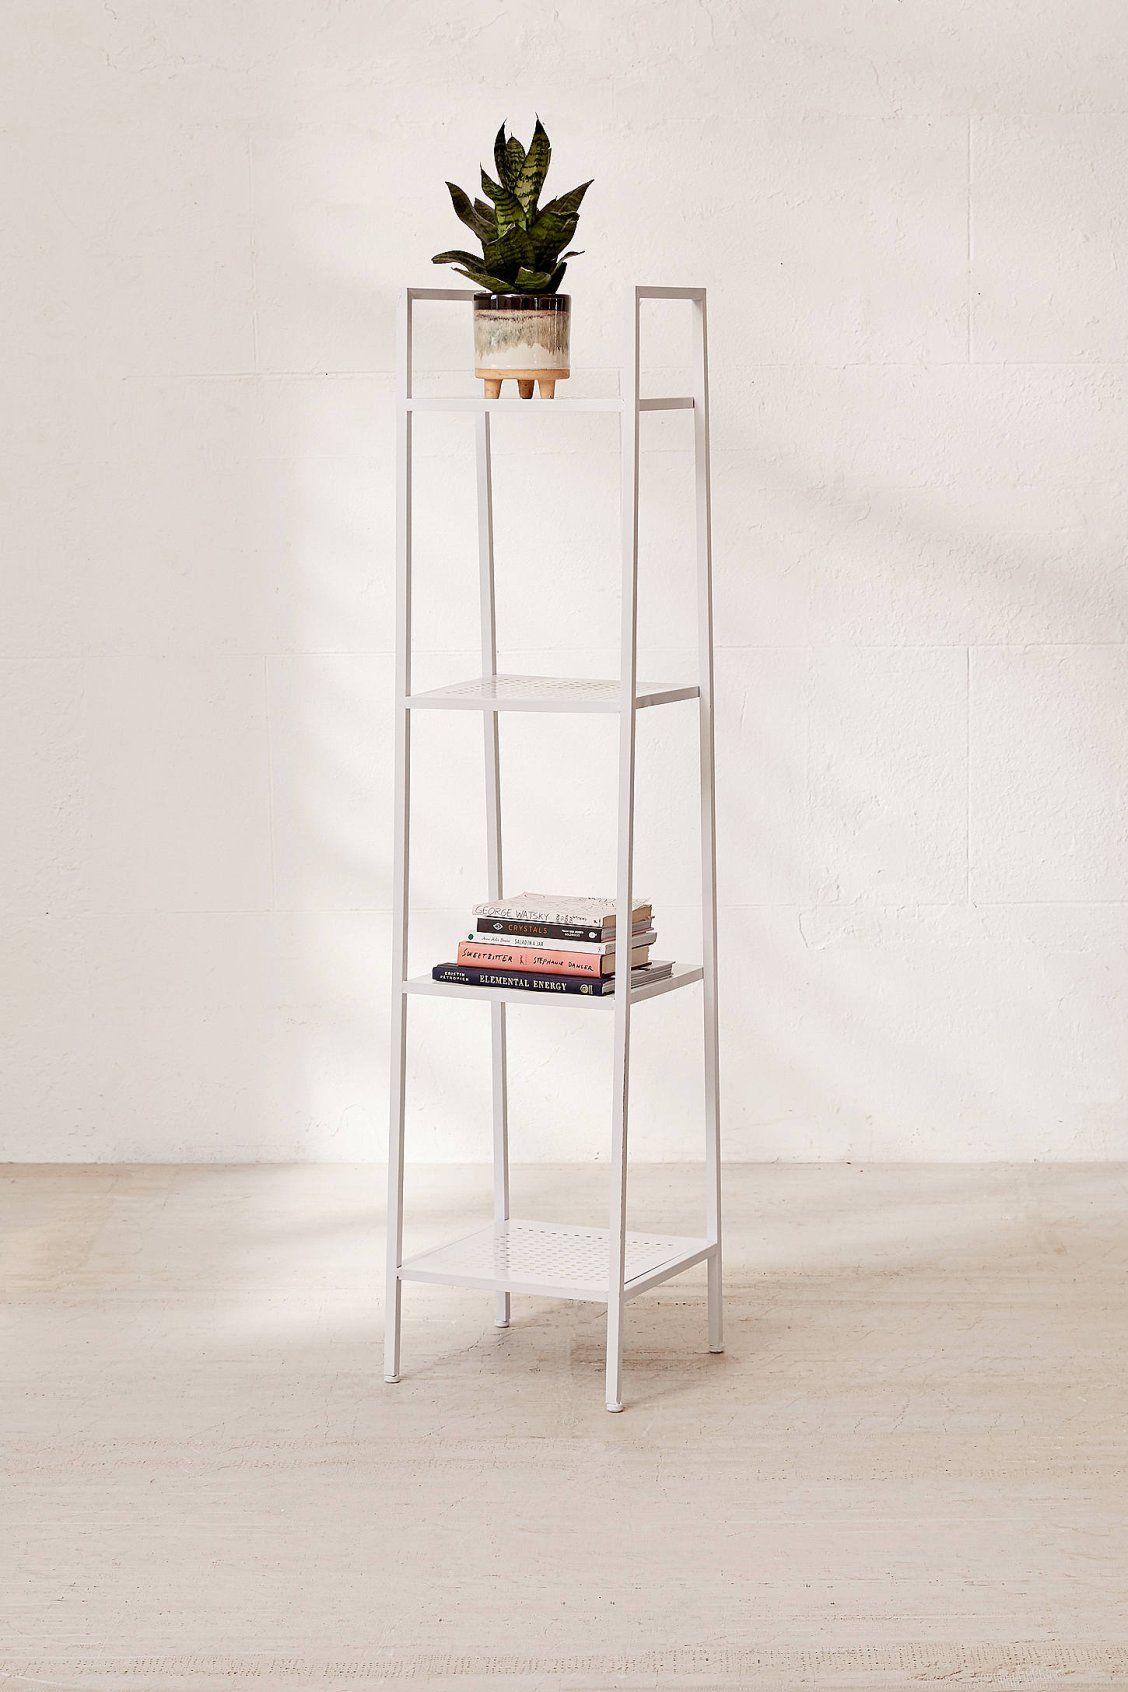 Maki Narrow Shelving Unit | Metal storage shelves, Urban ...